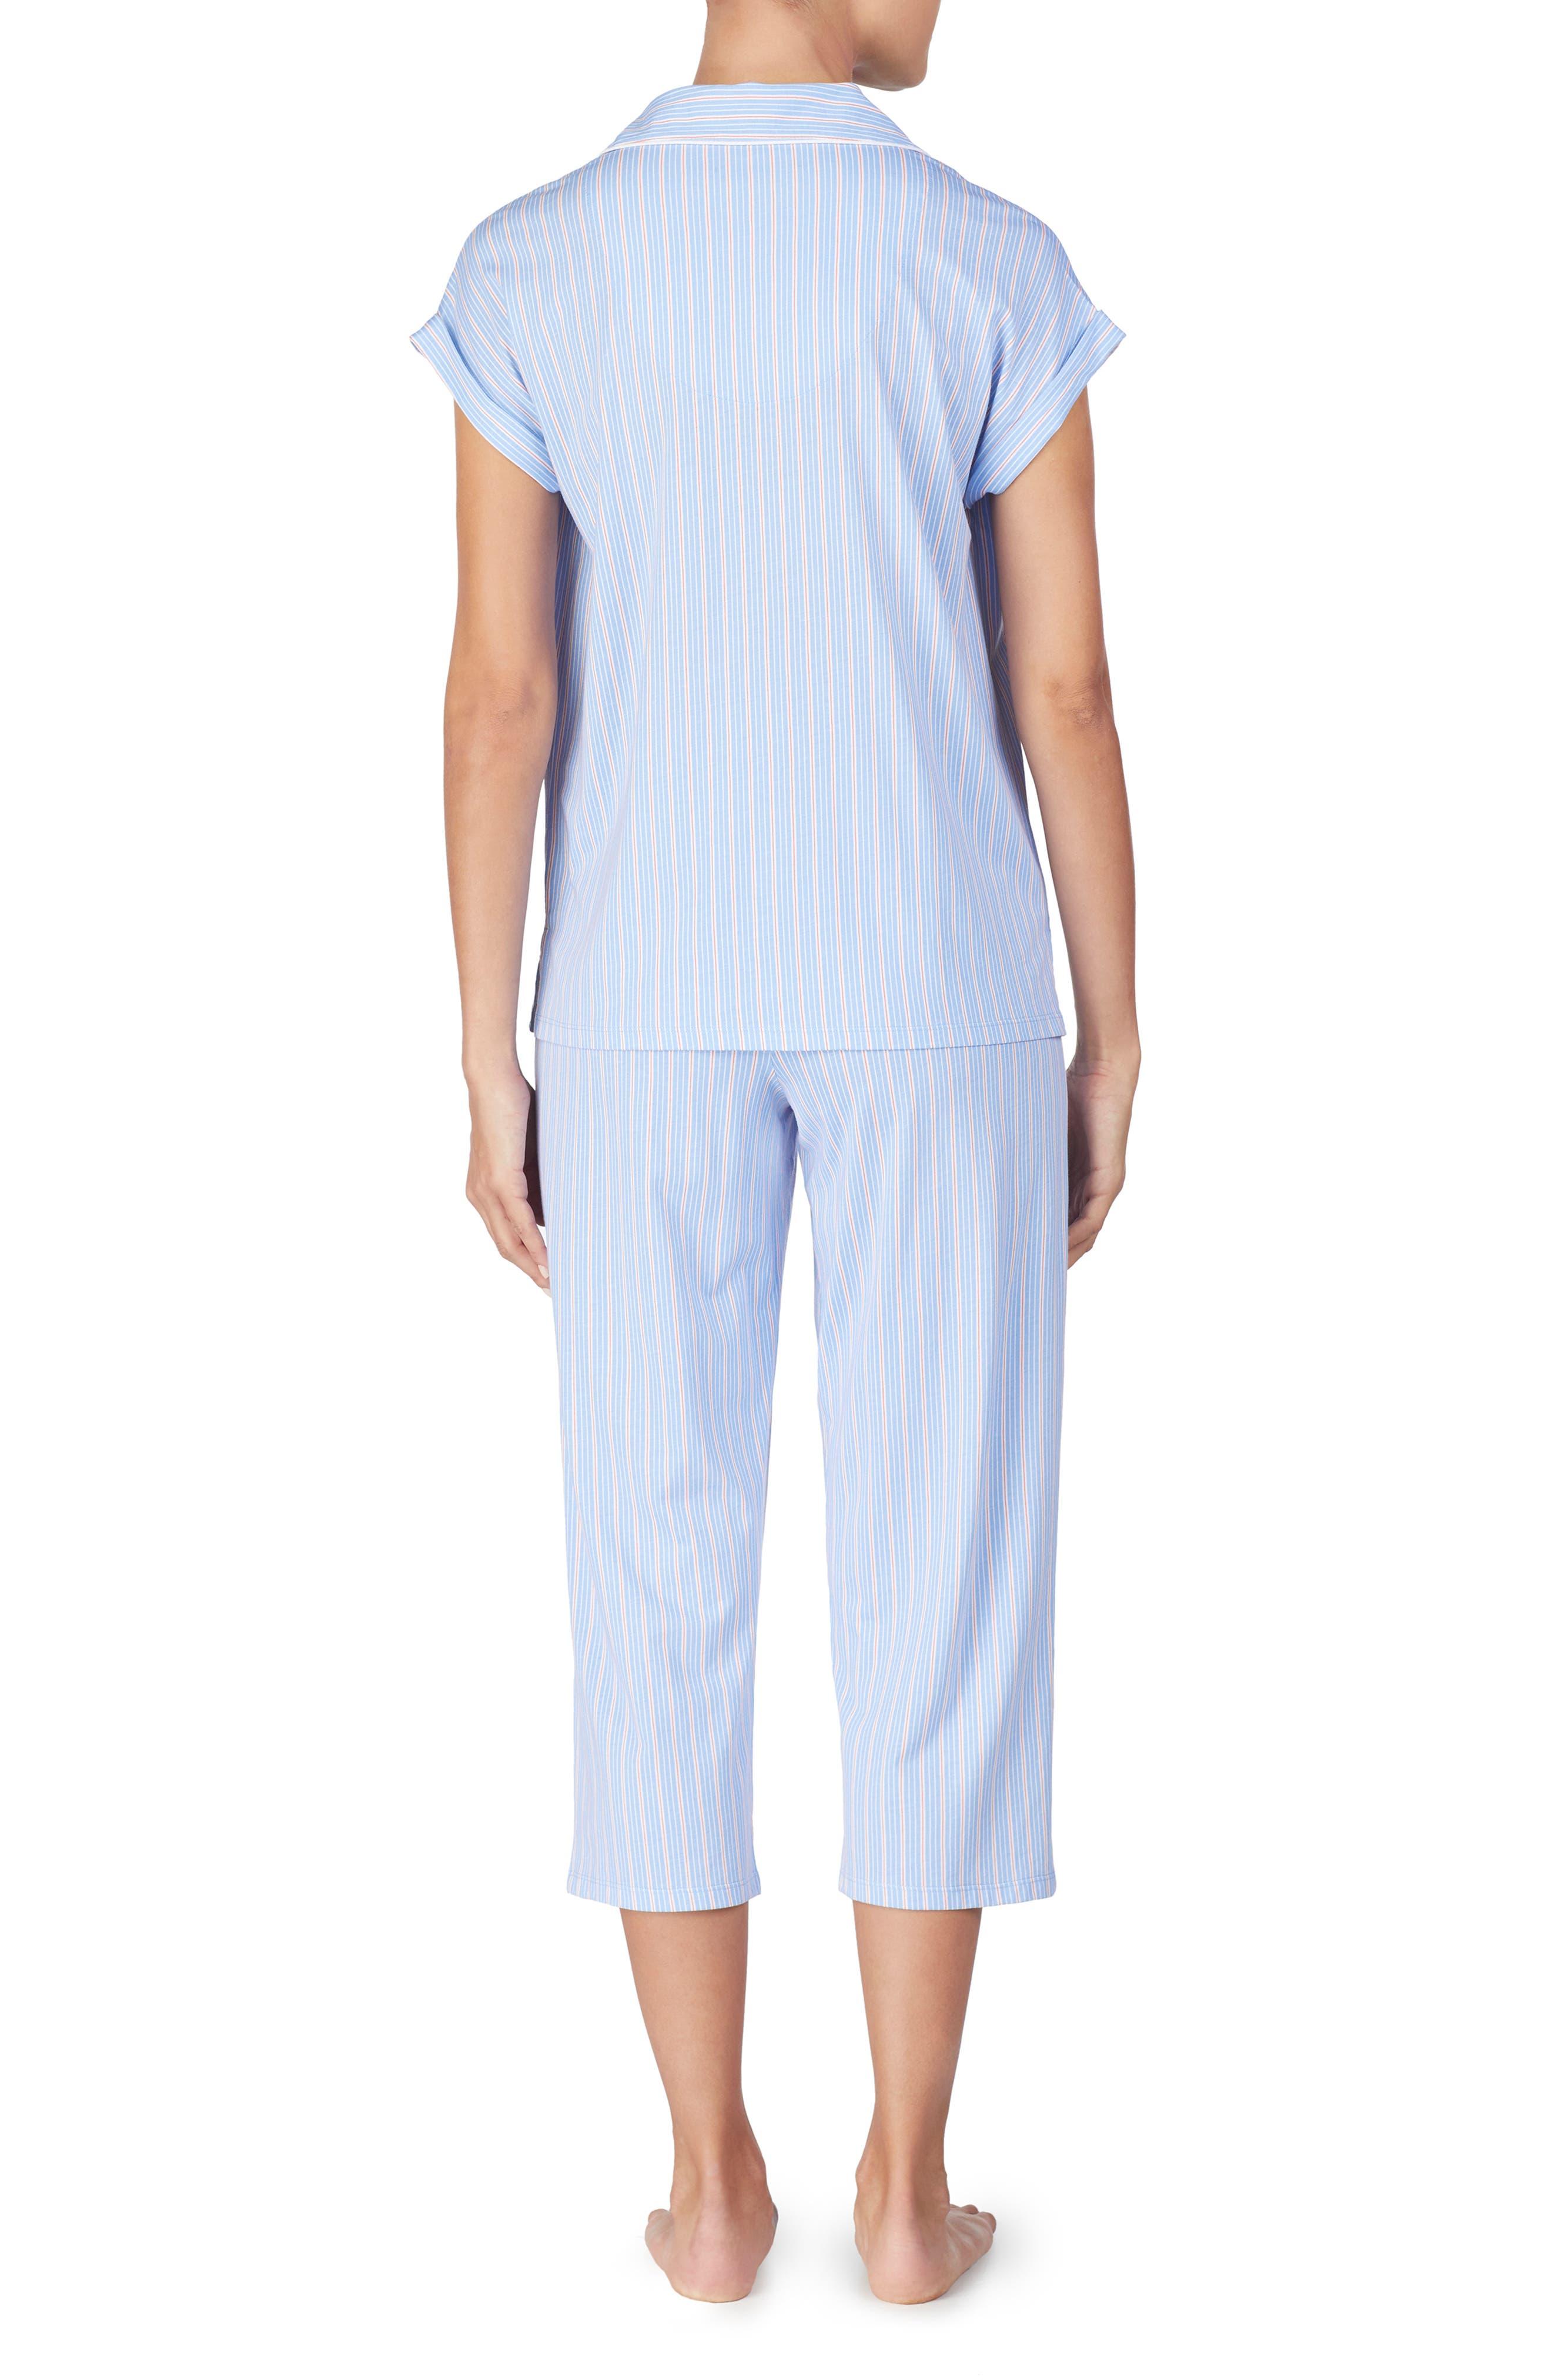 LAUREN RALPH LAUREN, Capri Pajamas, Alternate thumbnail 3, color, BLUE STRIPE